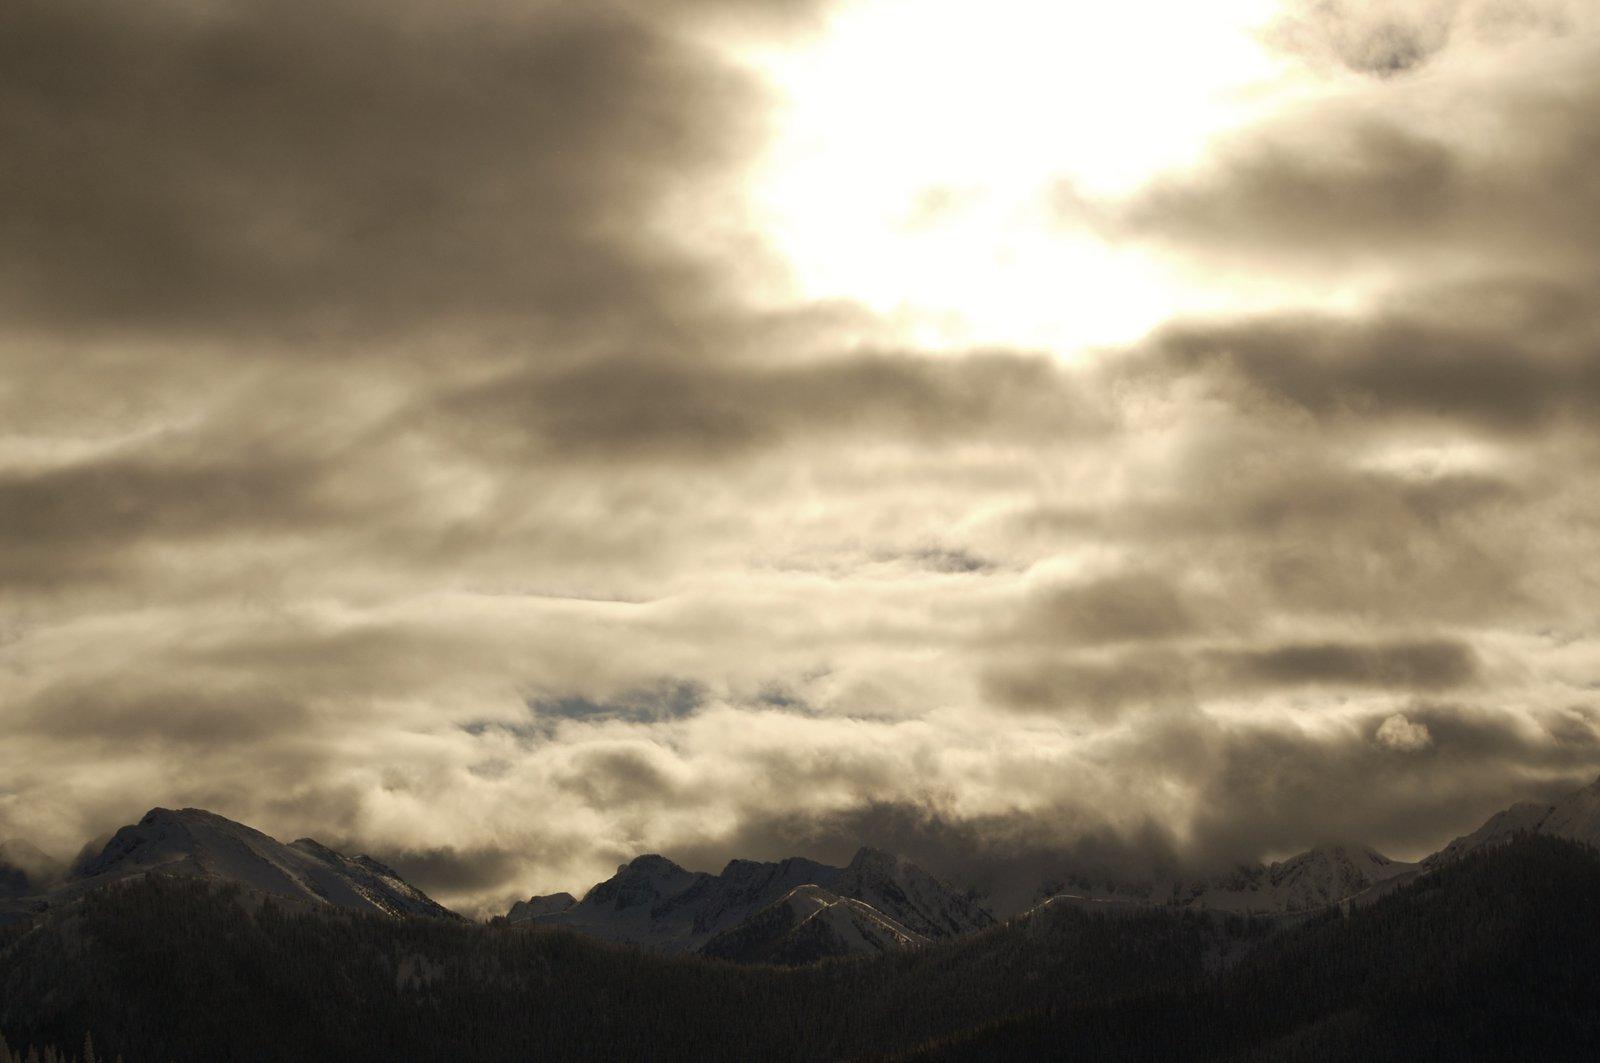 Manning scenery